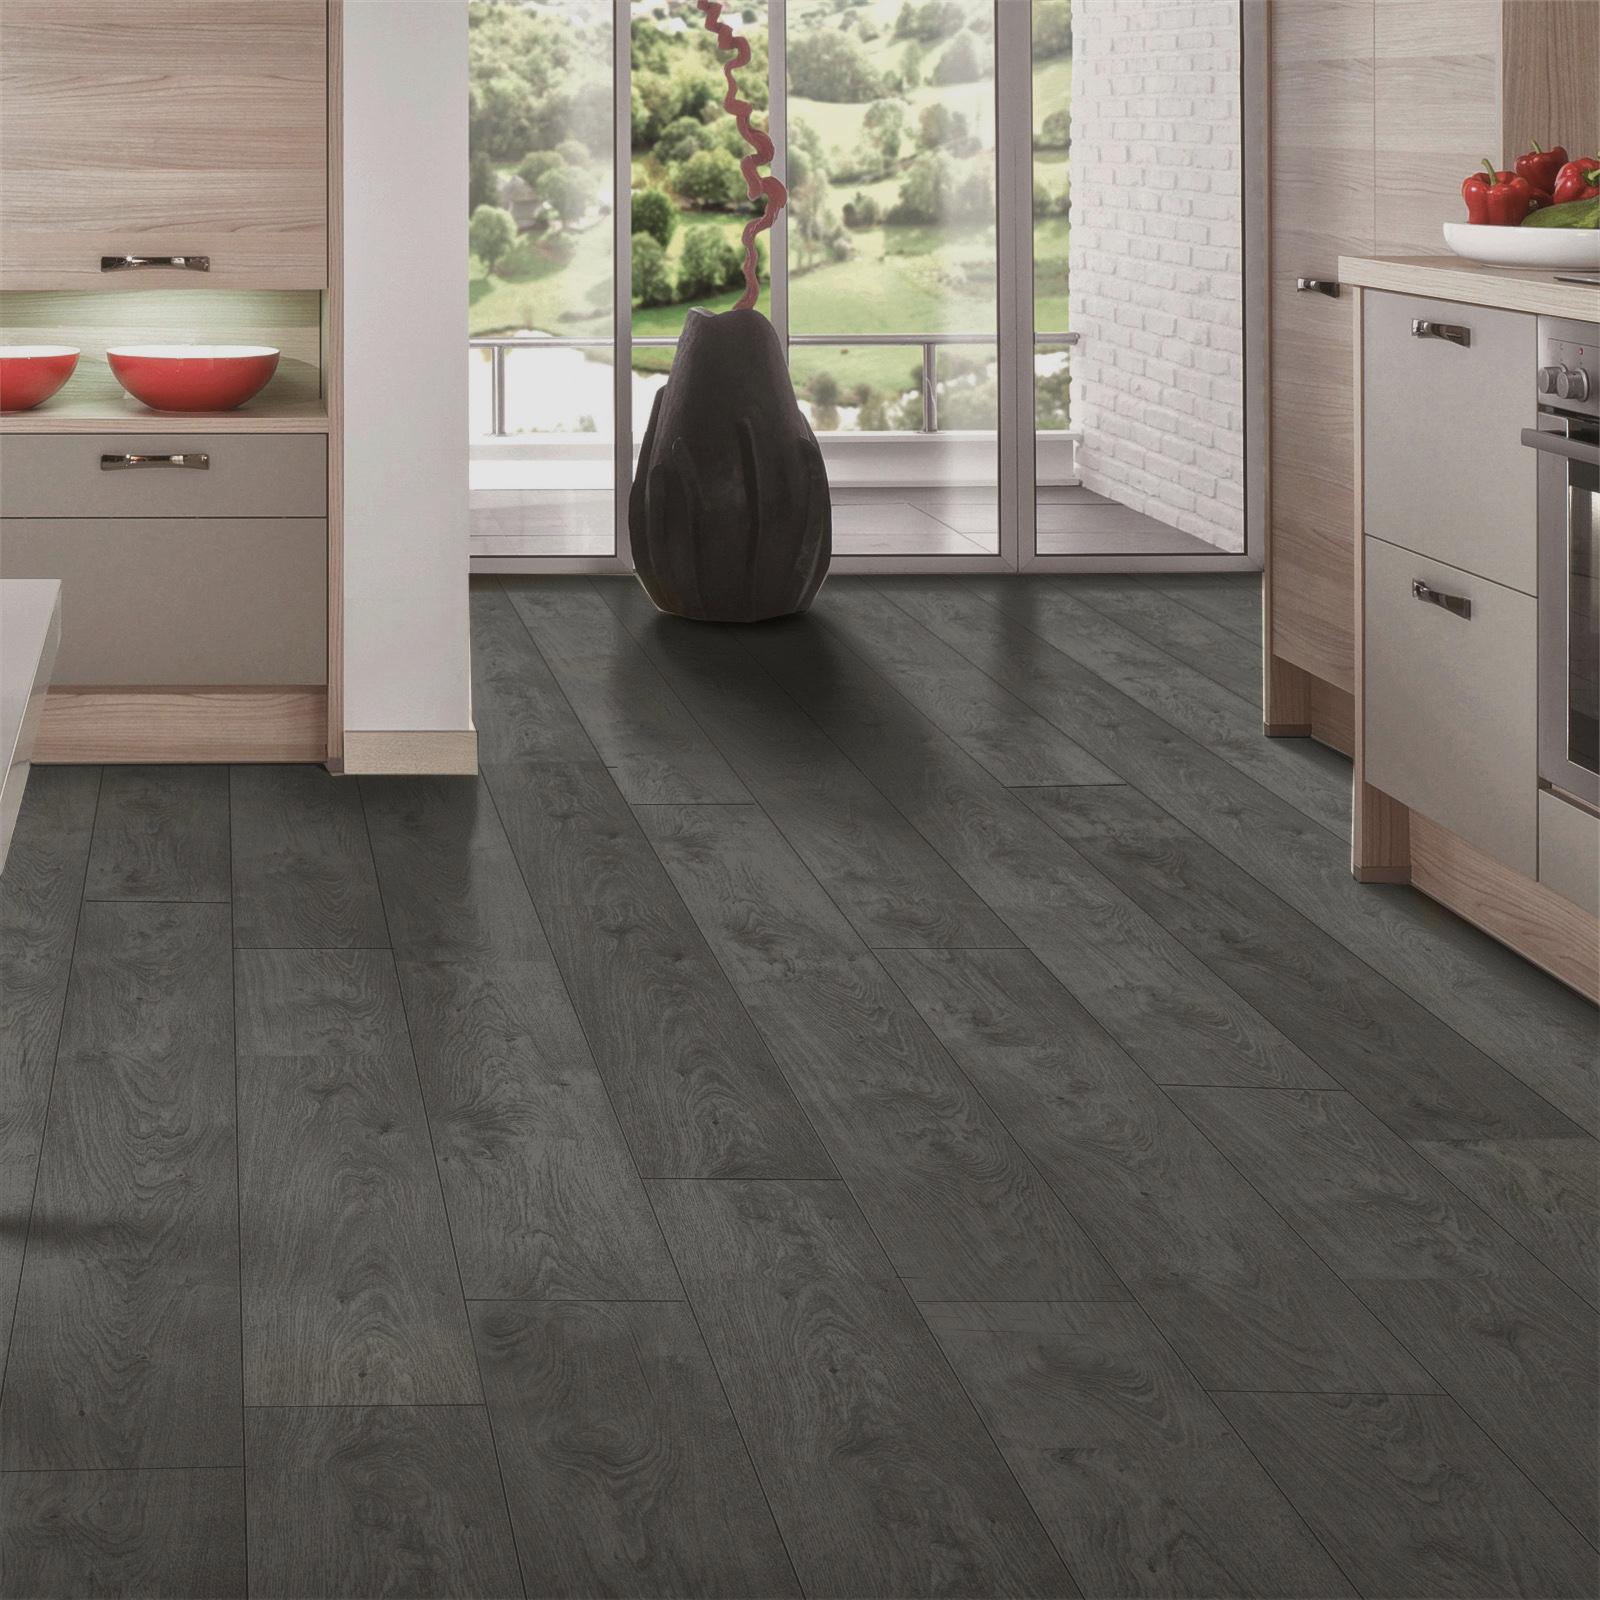 Quality Tiles Carpets Vinyl Rugs Amp Floorboards